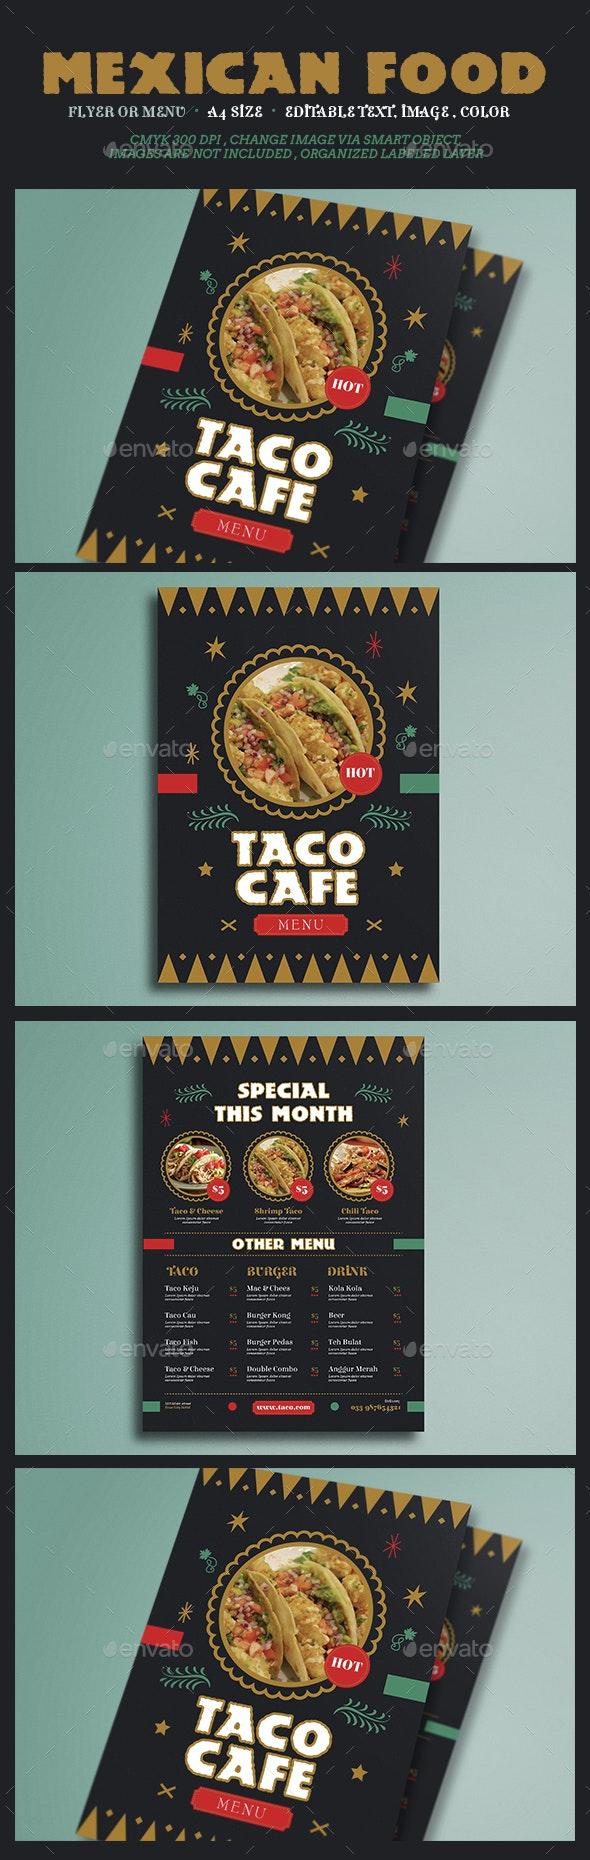 Mexican Food Flyer Menu - Food Menus Print Templates